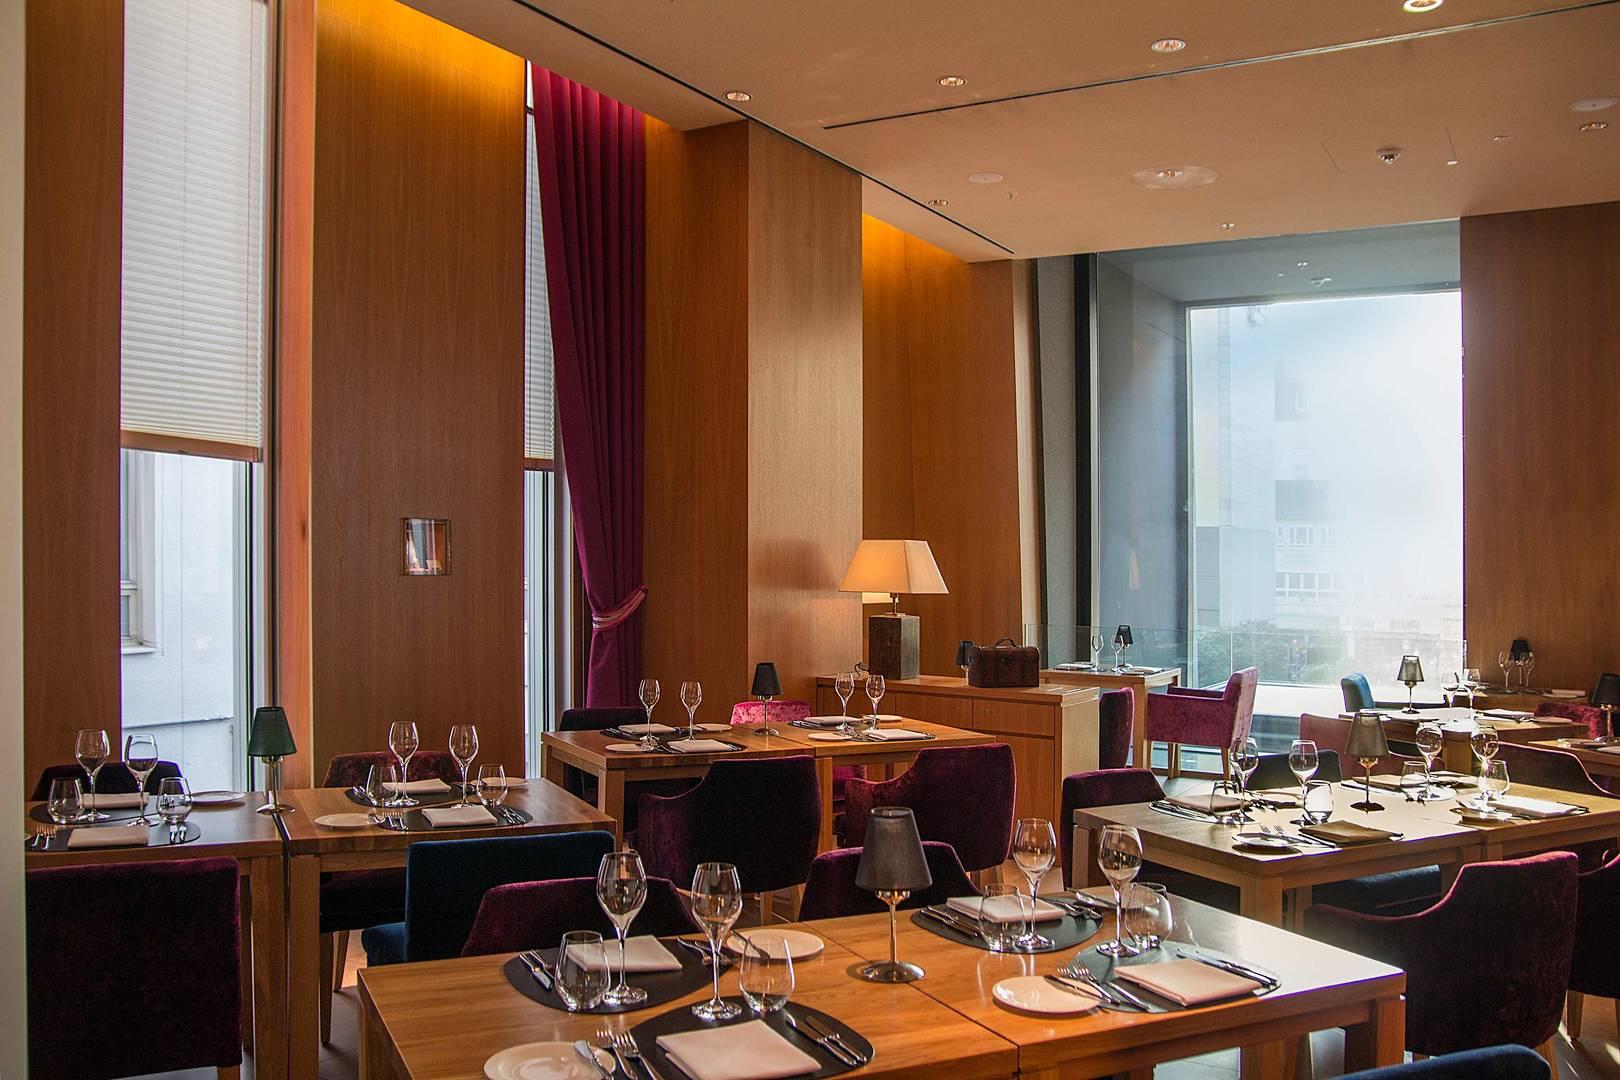 https://cdn.jumeirah.com/-/mediadh/DH/Hospitality/Jumeirah/Restaurants/Frankfurt/Frankfurt-Max-On-One-Grill-Room/Restaurant-Gallery/Jumeirah-Frankfurt-Max-on-One-Grillroom-2_6-4.jpg?h=1080&w=1620&hash=63C7E2C65ED868FC3A5BE4E7657C50AC